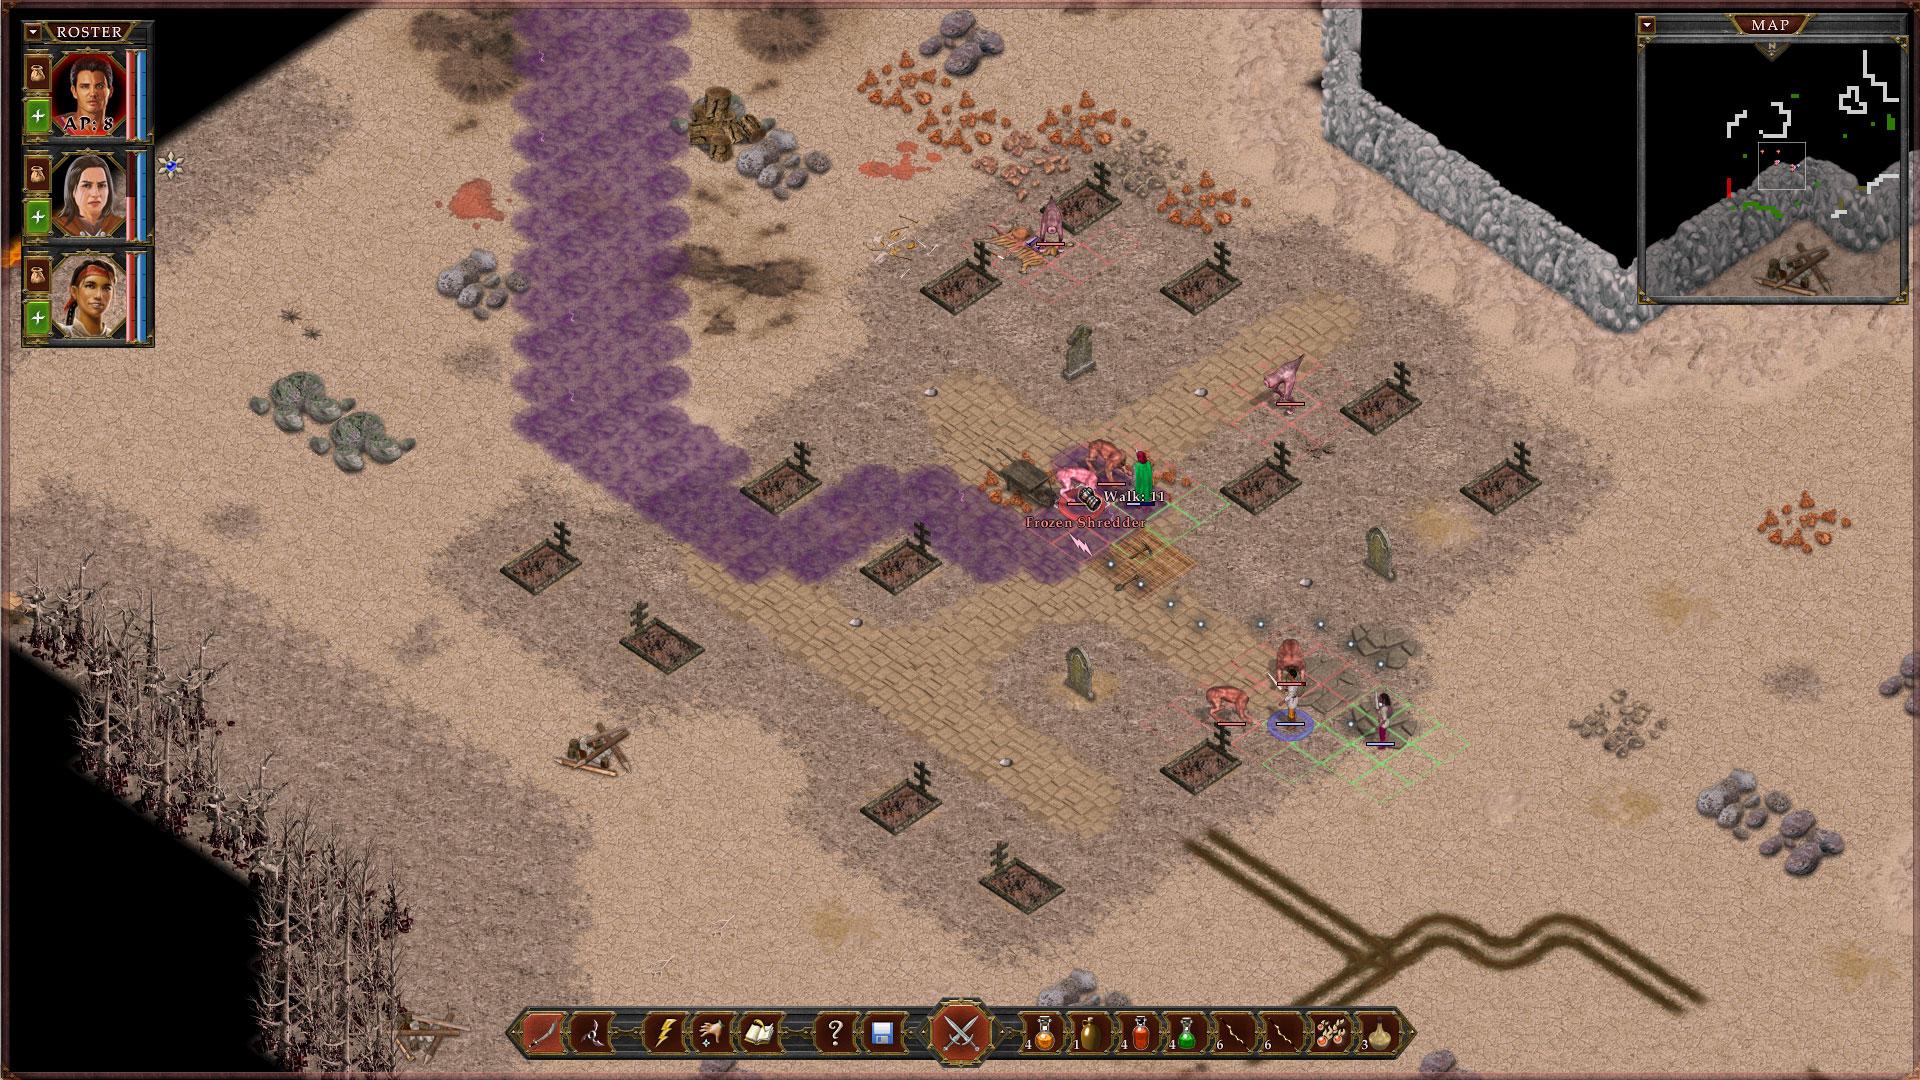 Avadon 3: The Warborn Screenshot 2